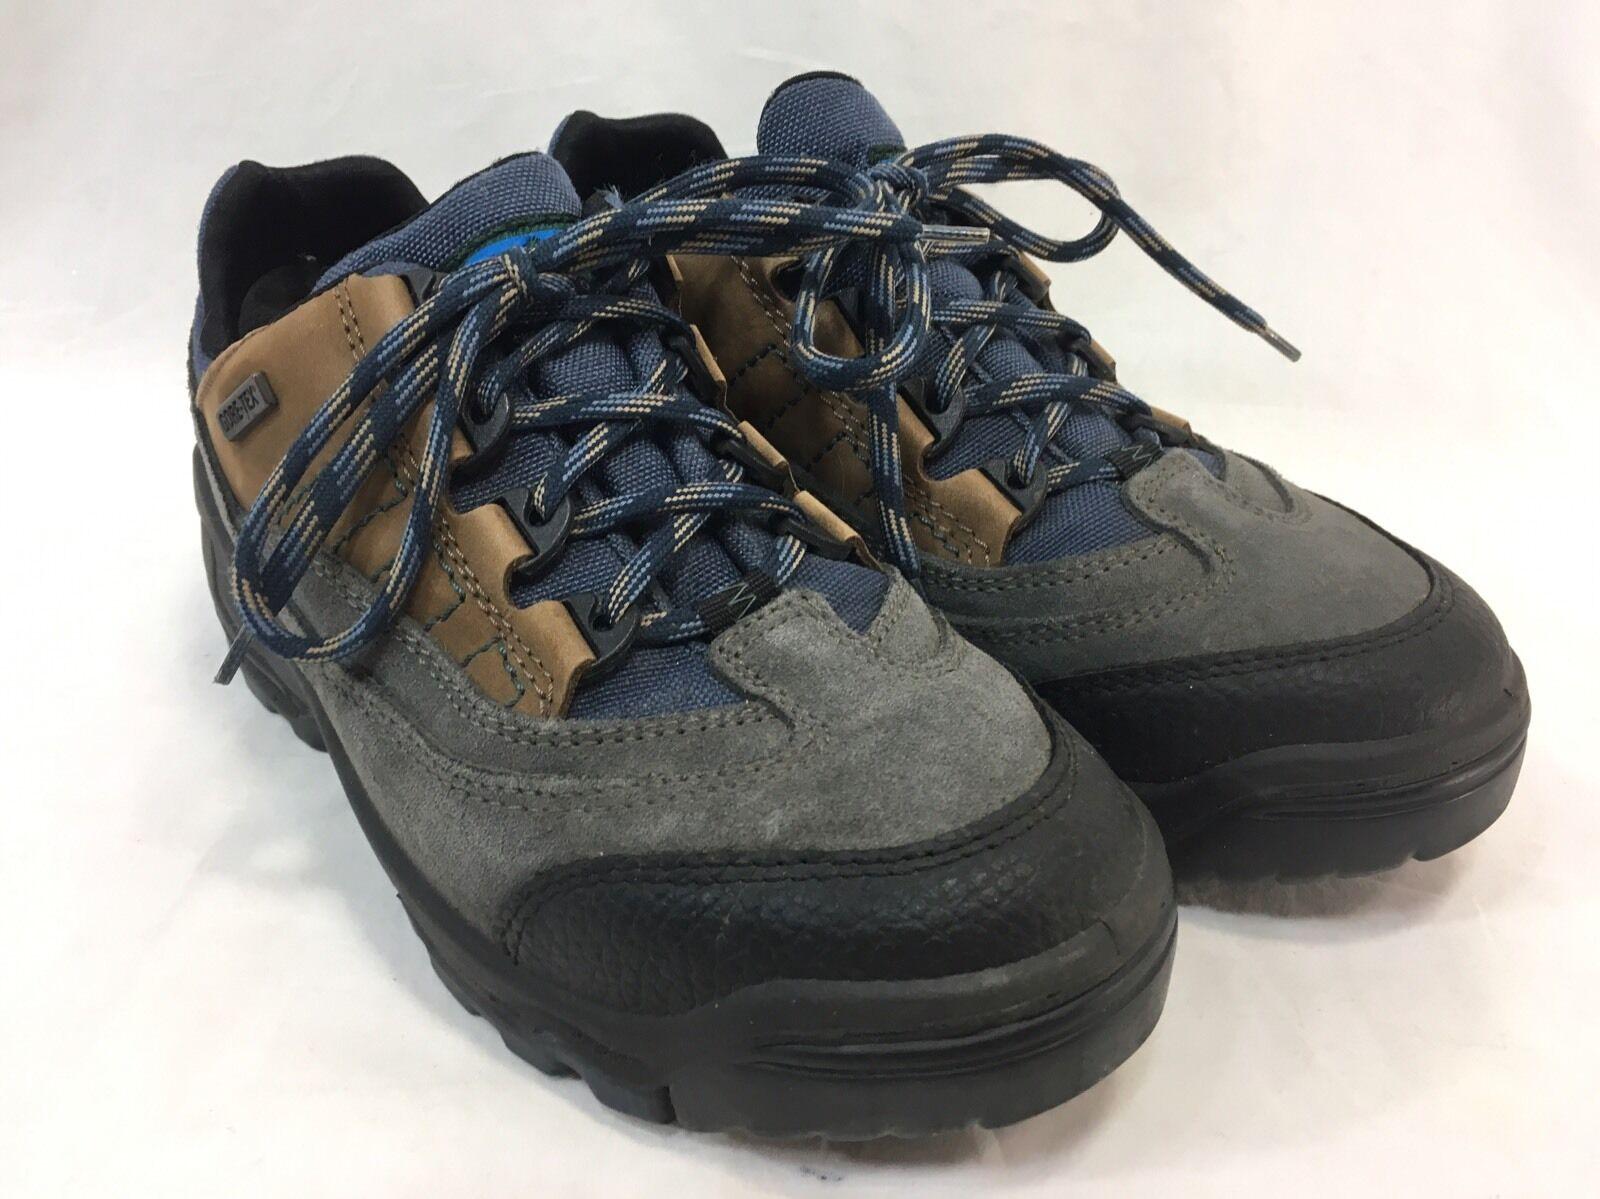 LL Bean Gore-Tex Niedrig Damenschuhe 9 Hiking Stiefel Schuhes Niedrig Gore-Tex Ankle Leder Suede Cresta EGUC c893eb